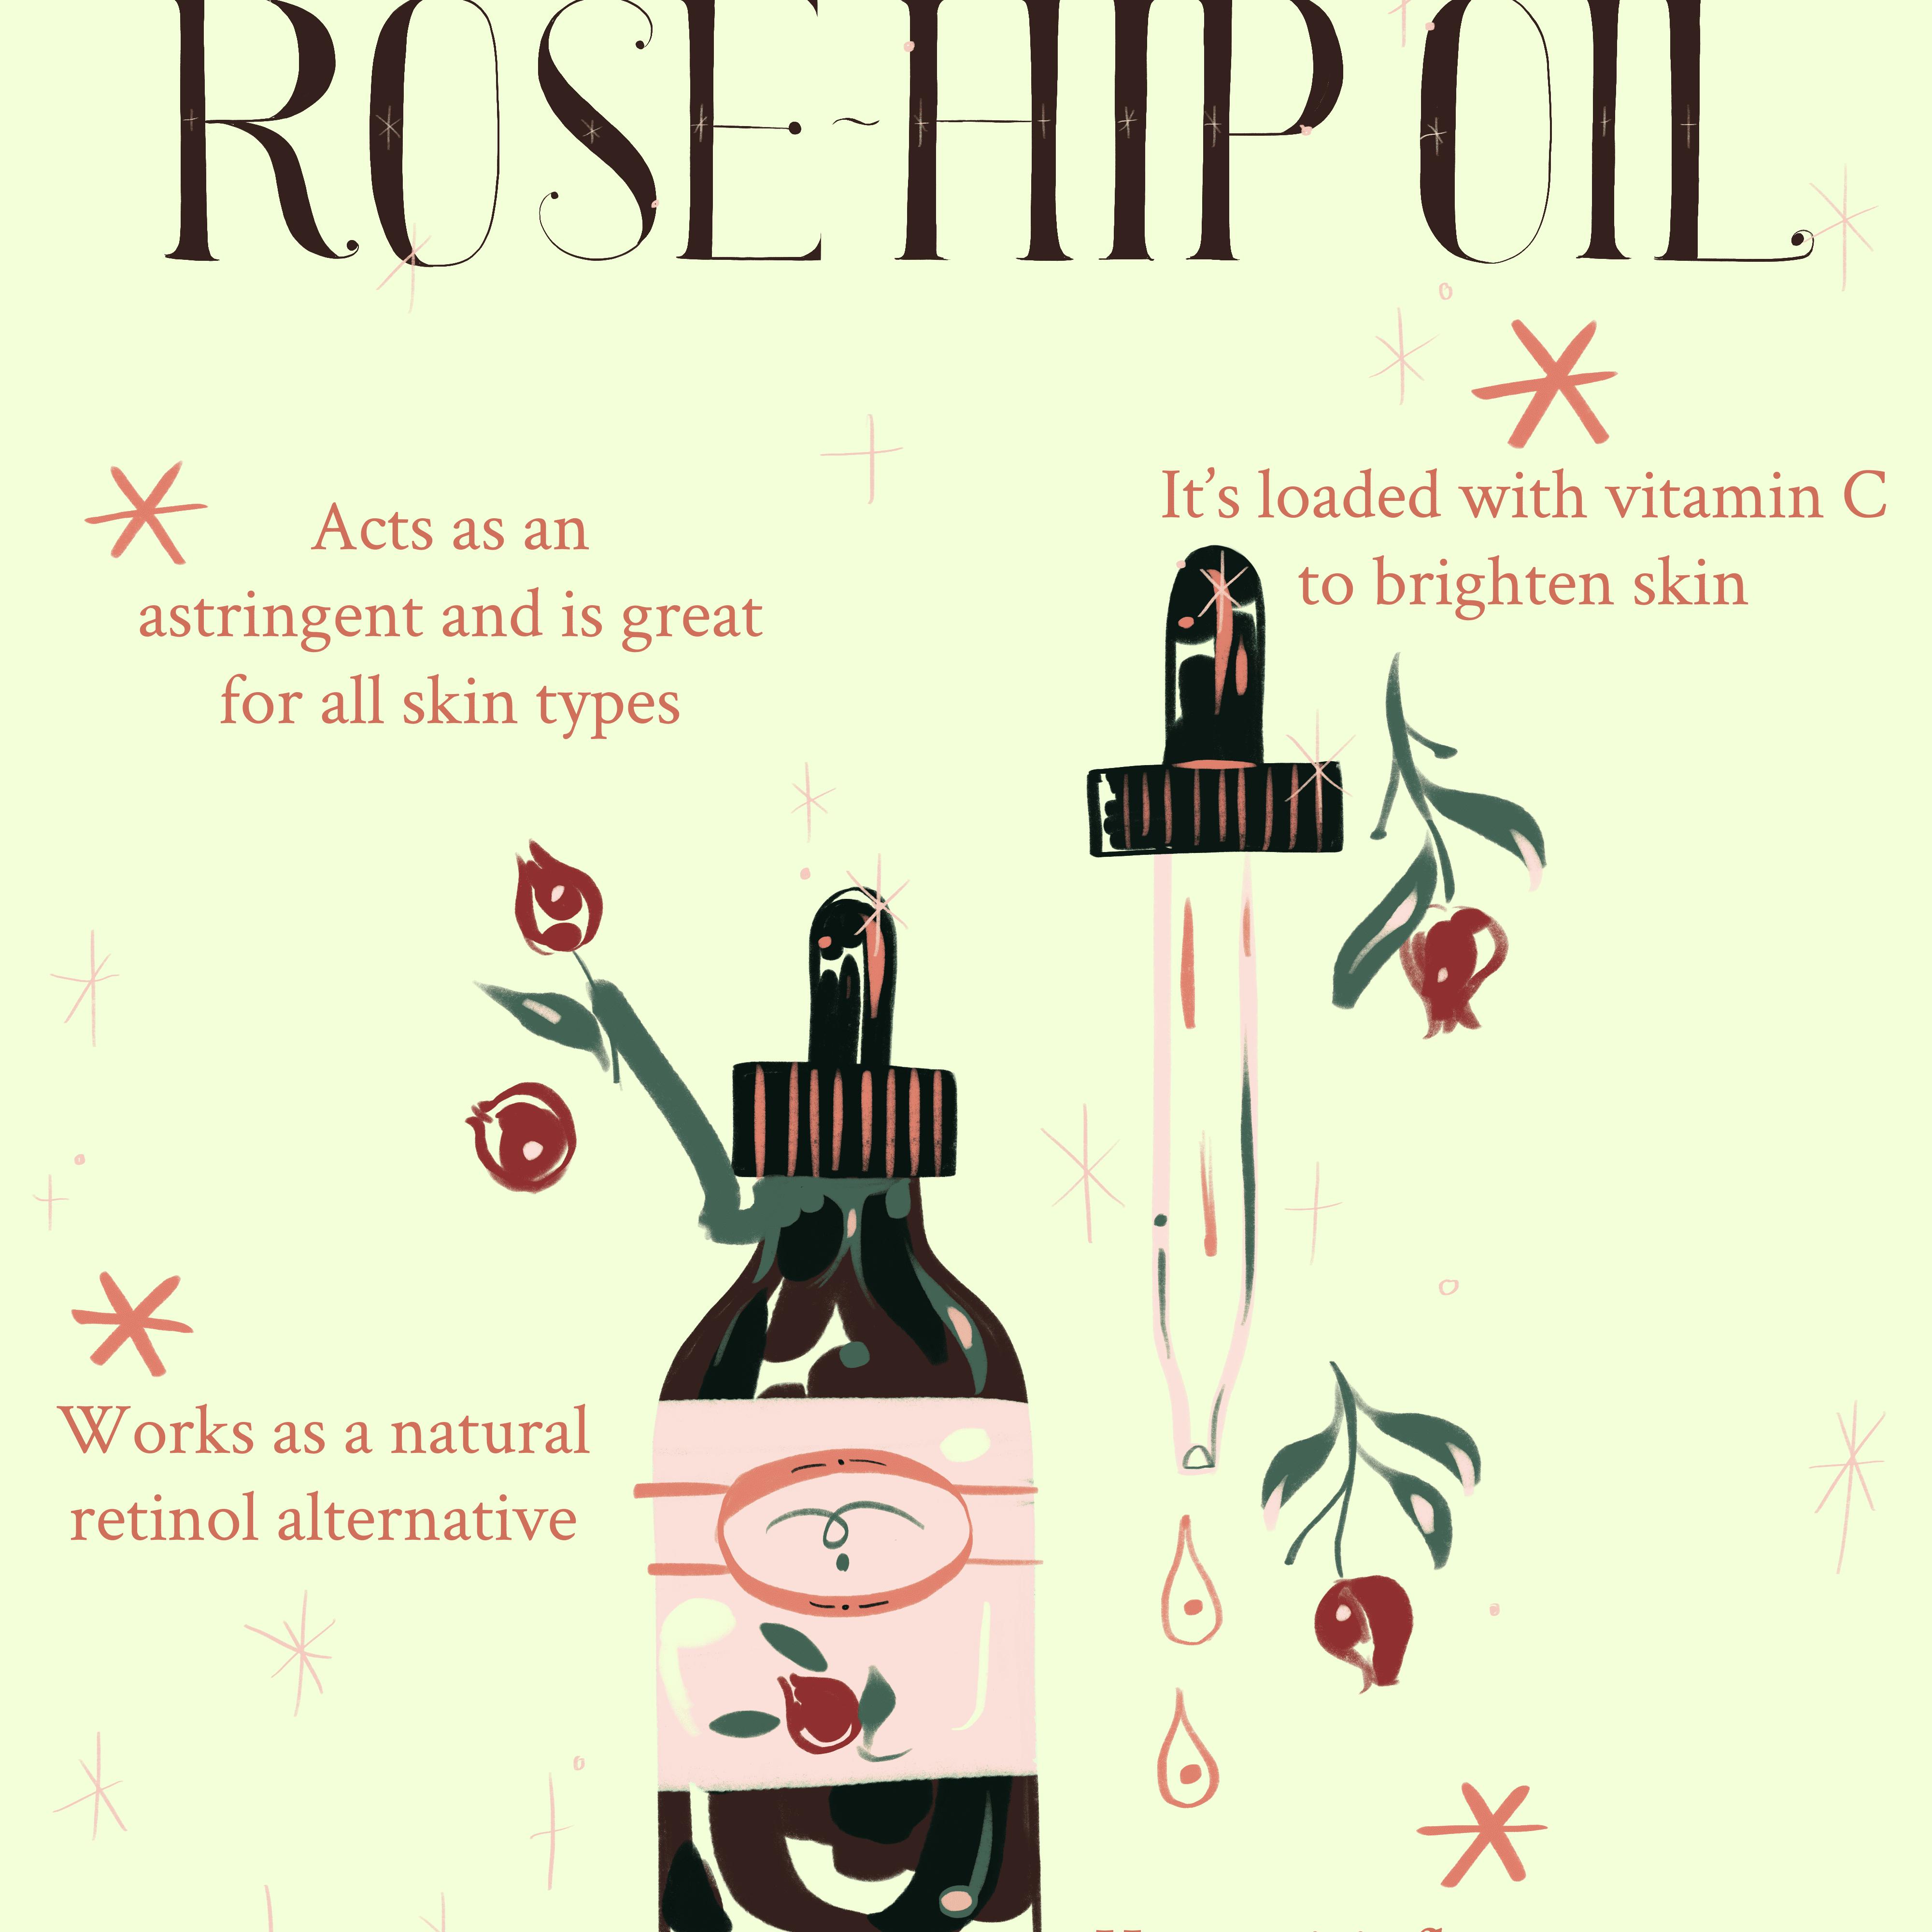 Benefits of Rose Hip Oil